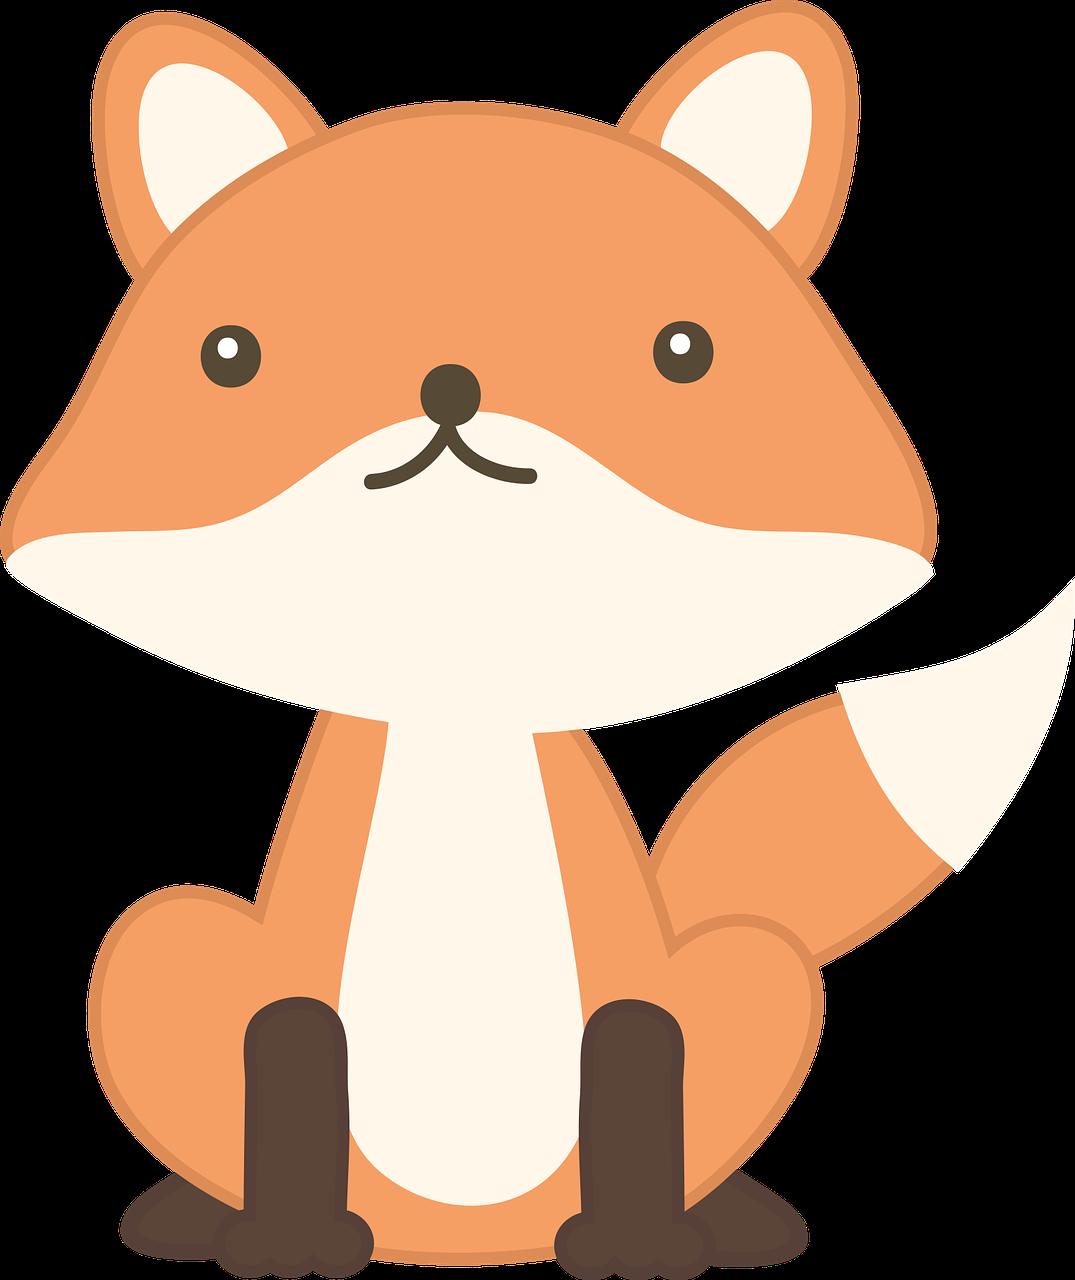 Raposa Animal Selvagem Grafico Vetorial Gratis No Pixabay